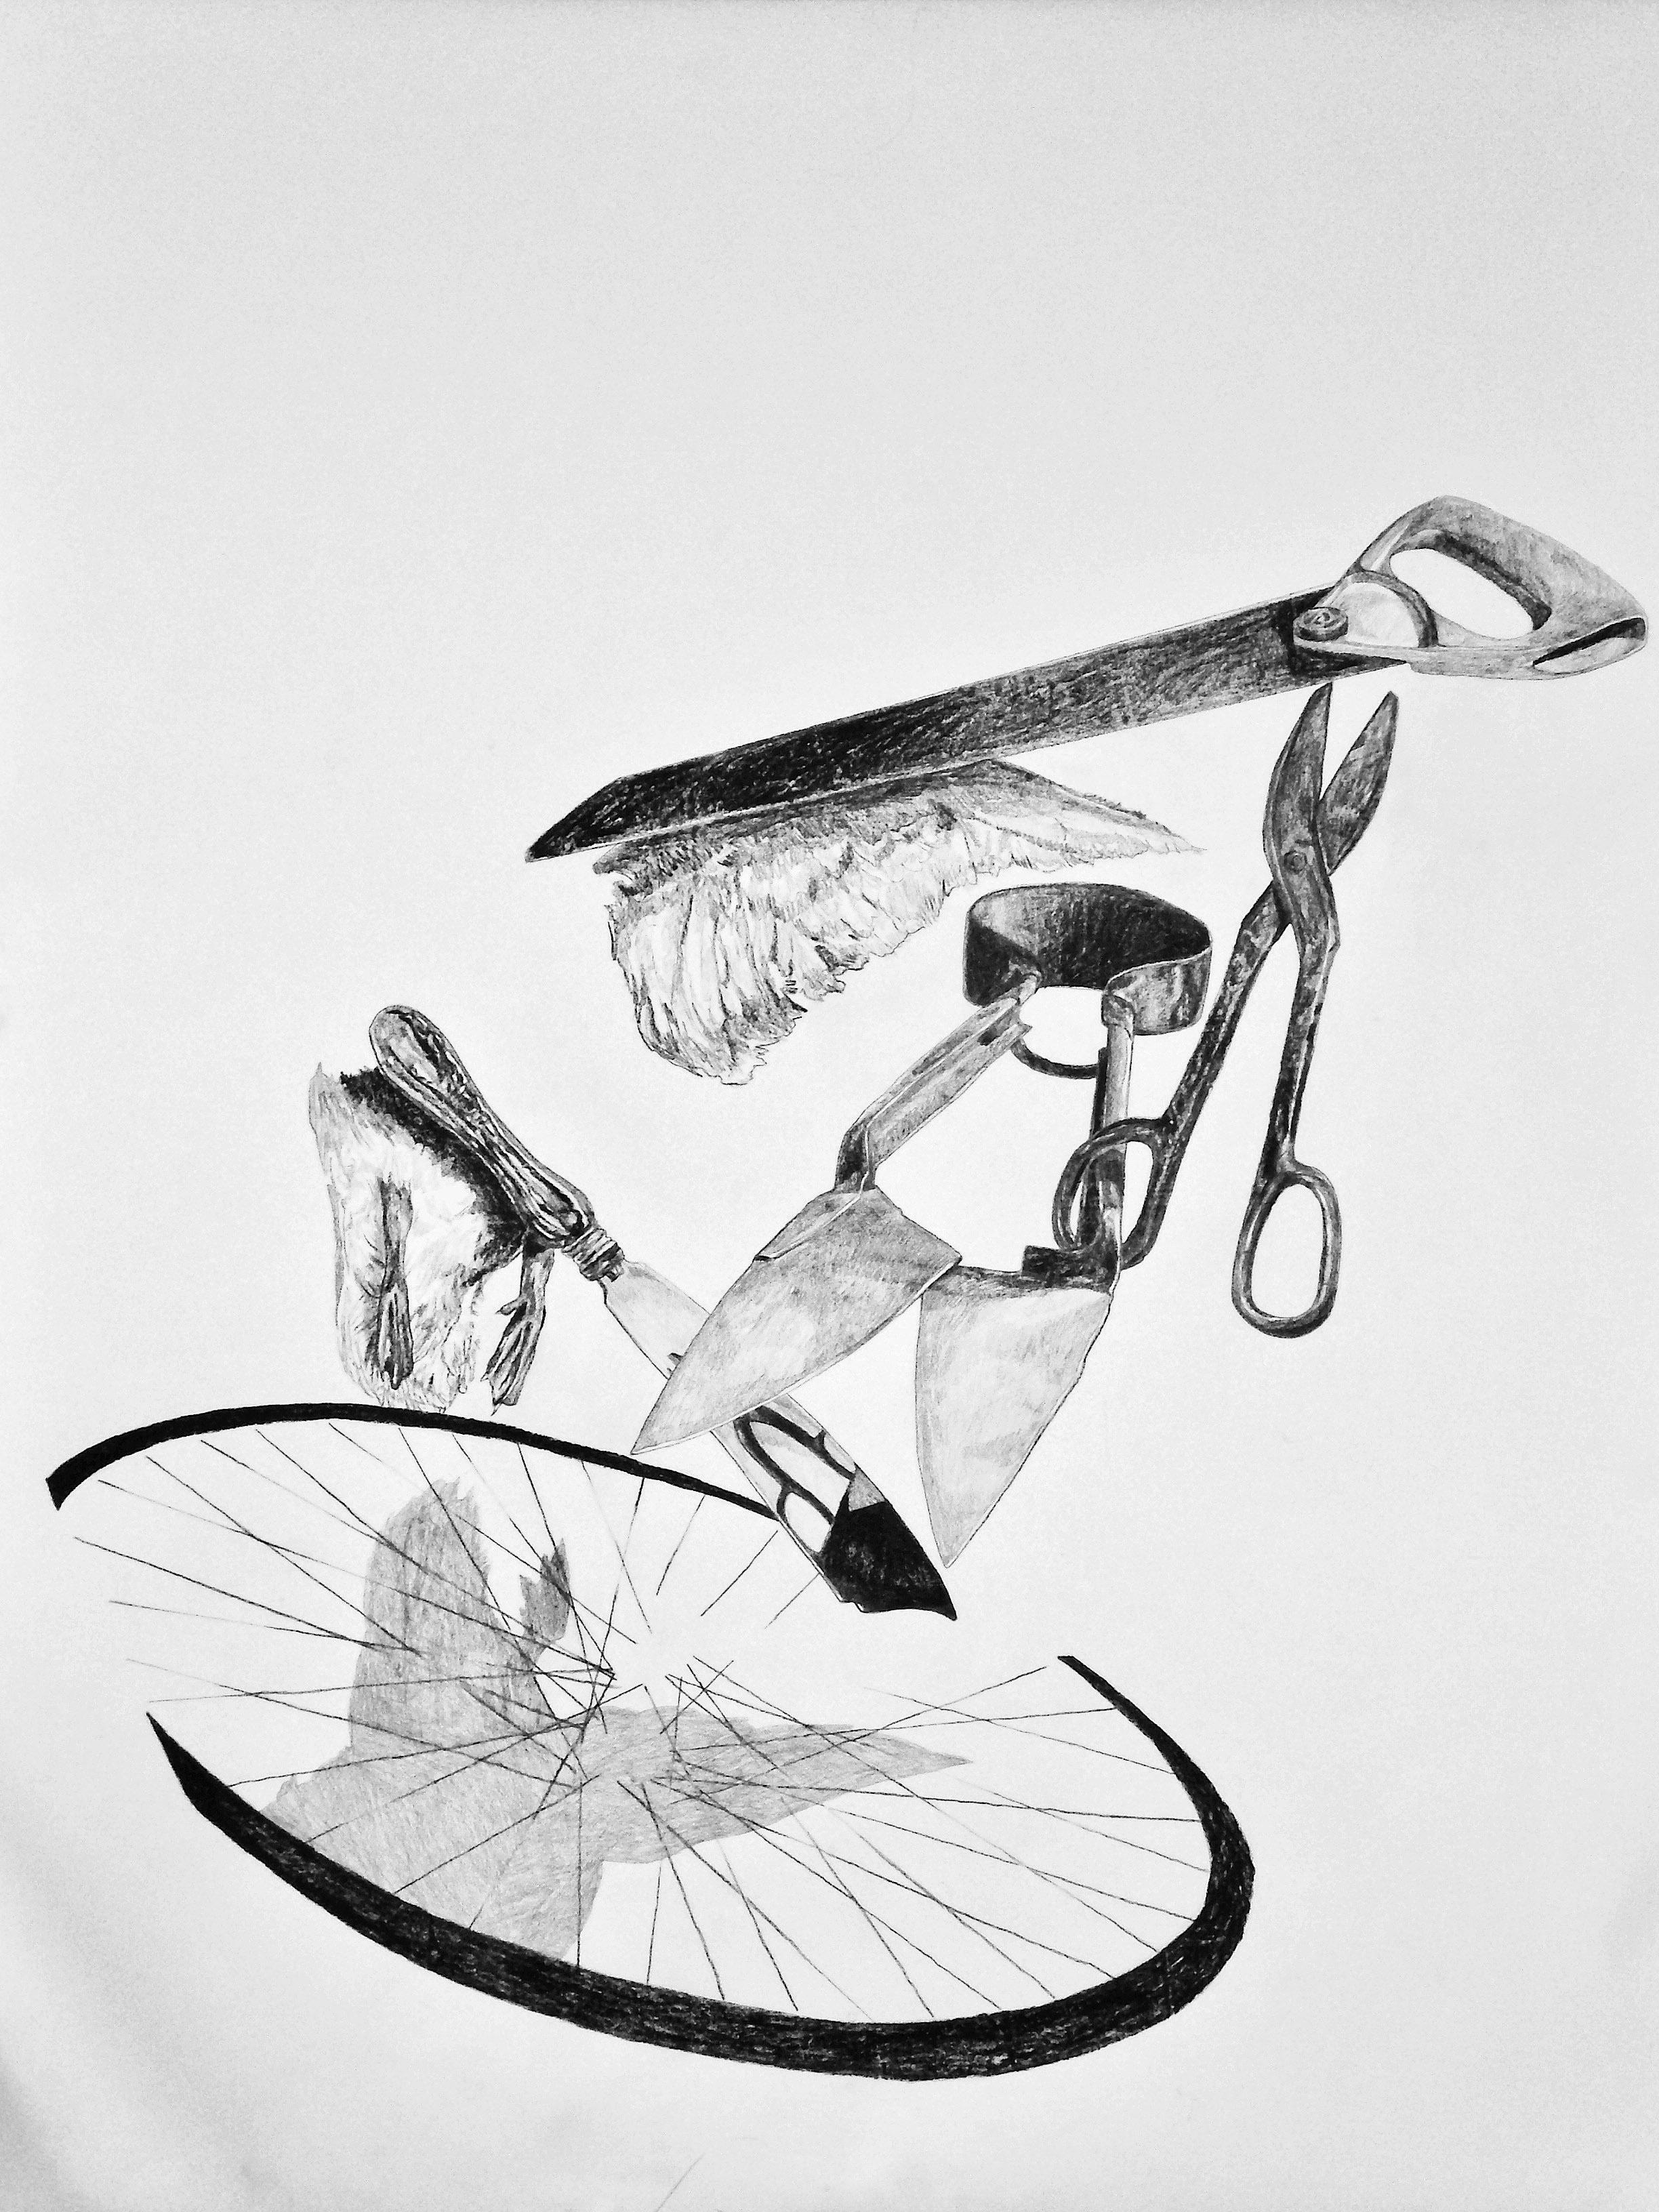 maidia bird image.jpg